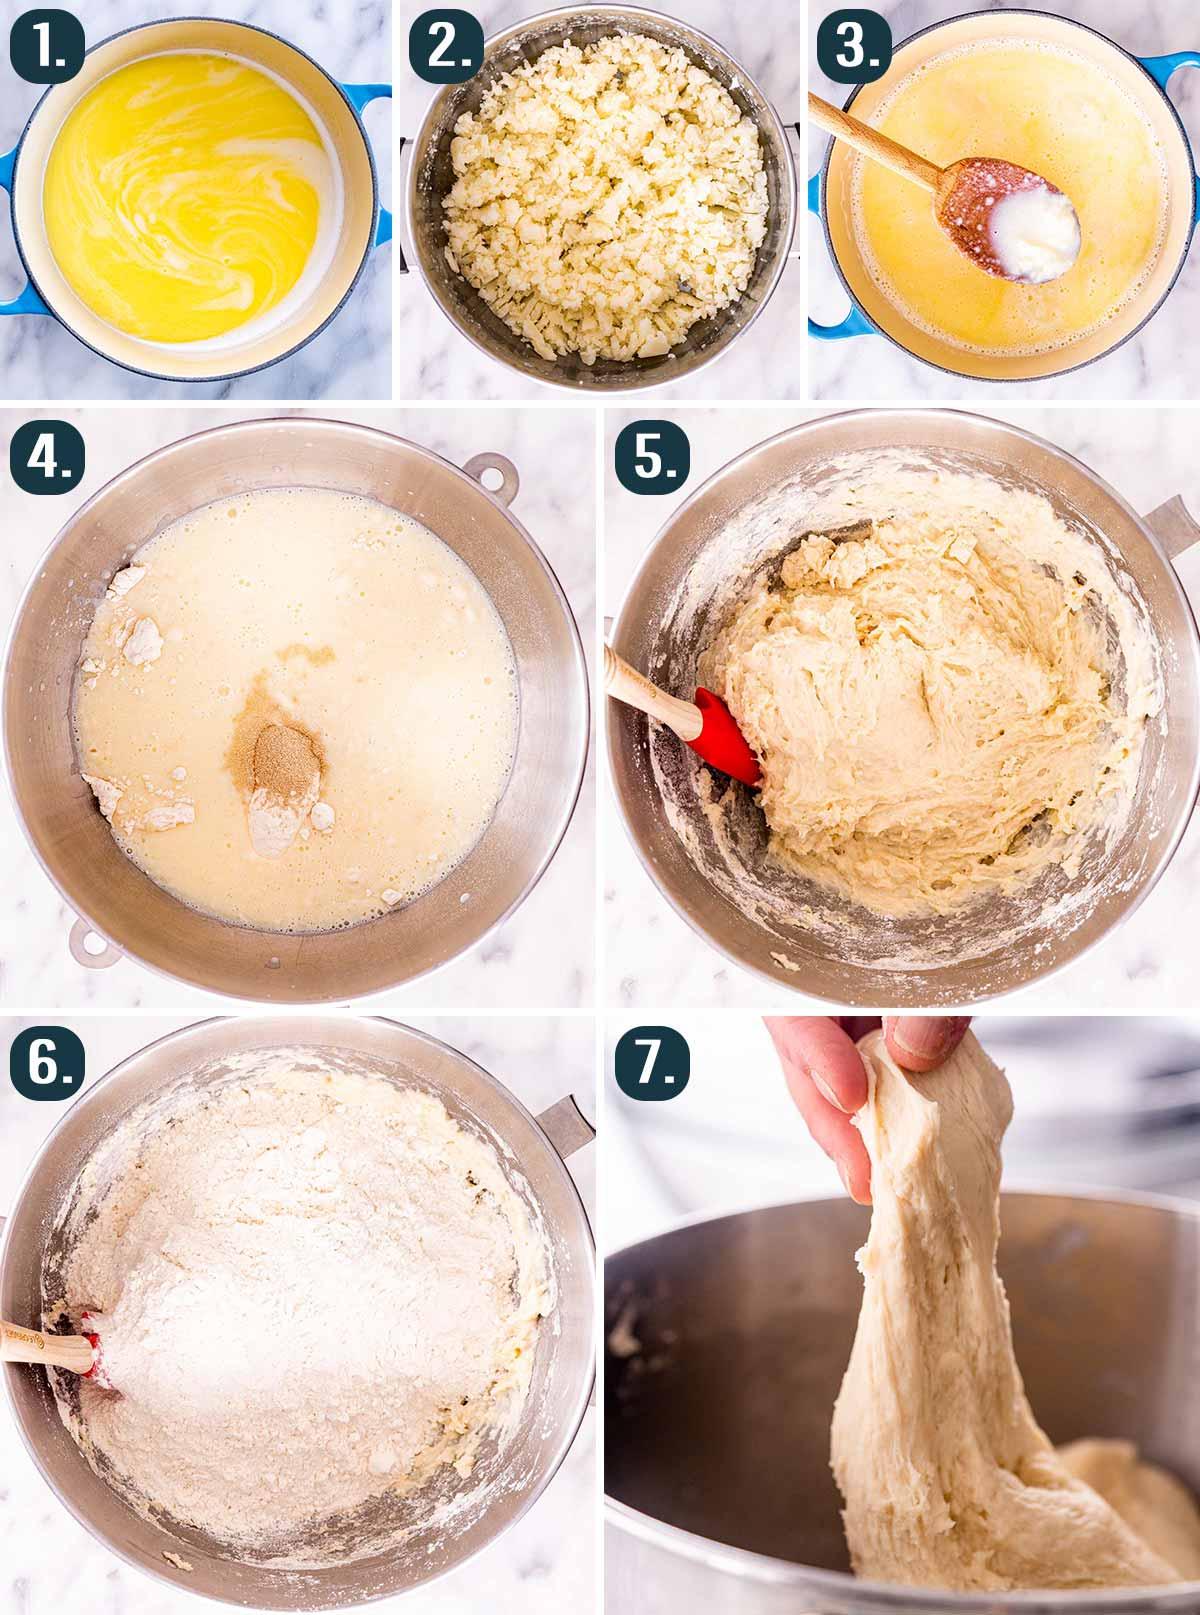 detailed process shots showing how to make dough for homemade potato dough.